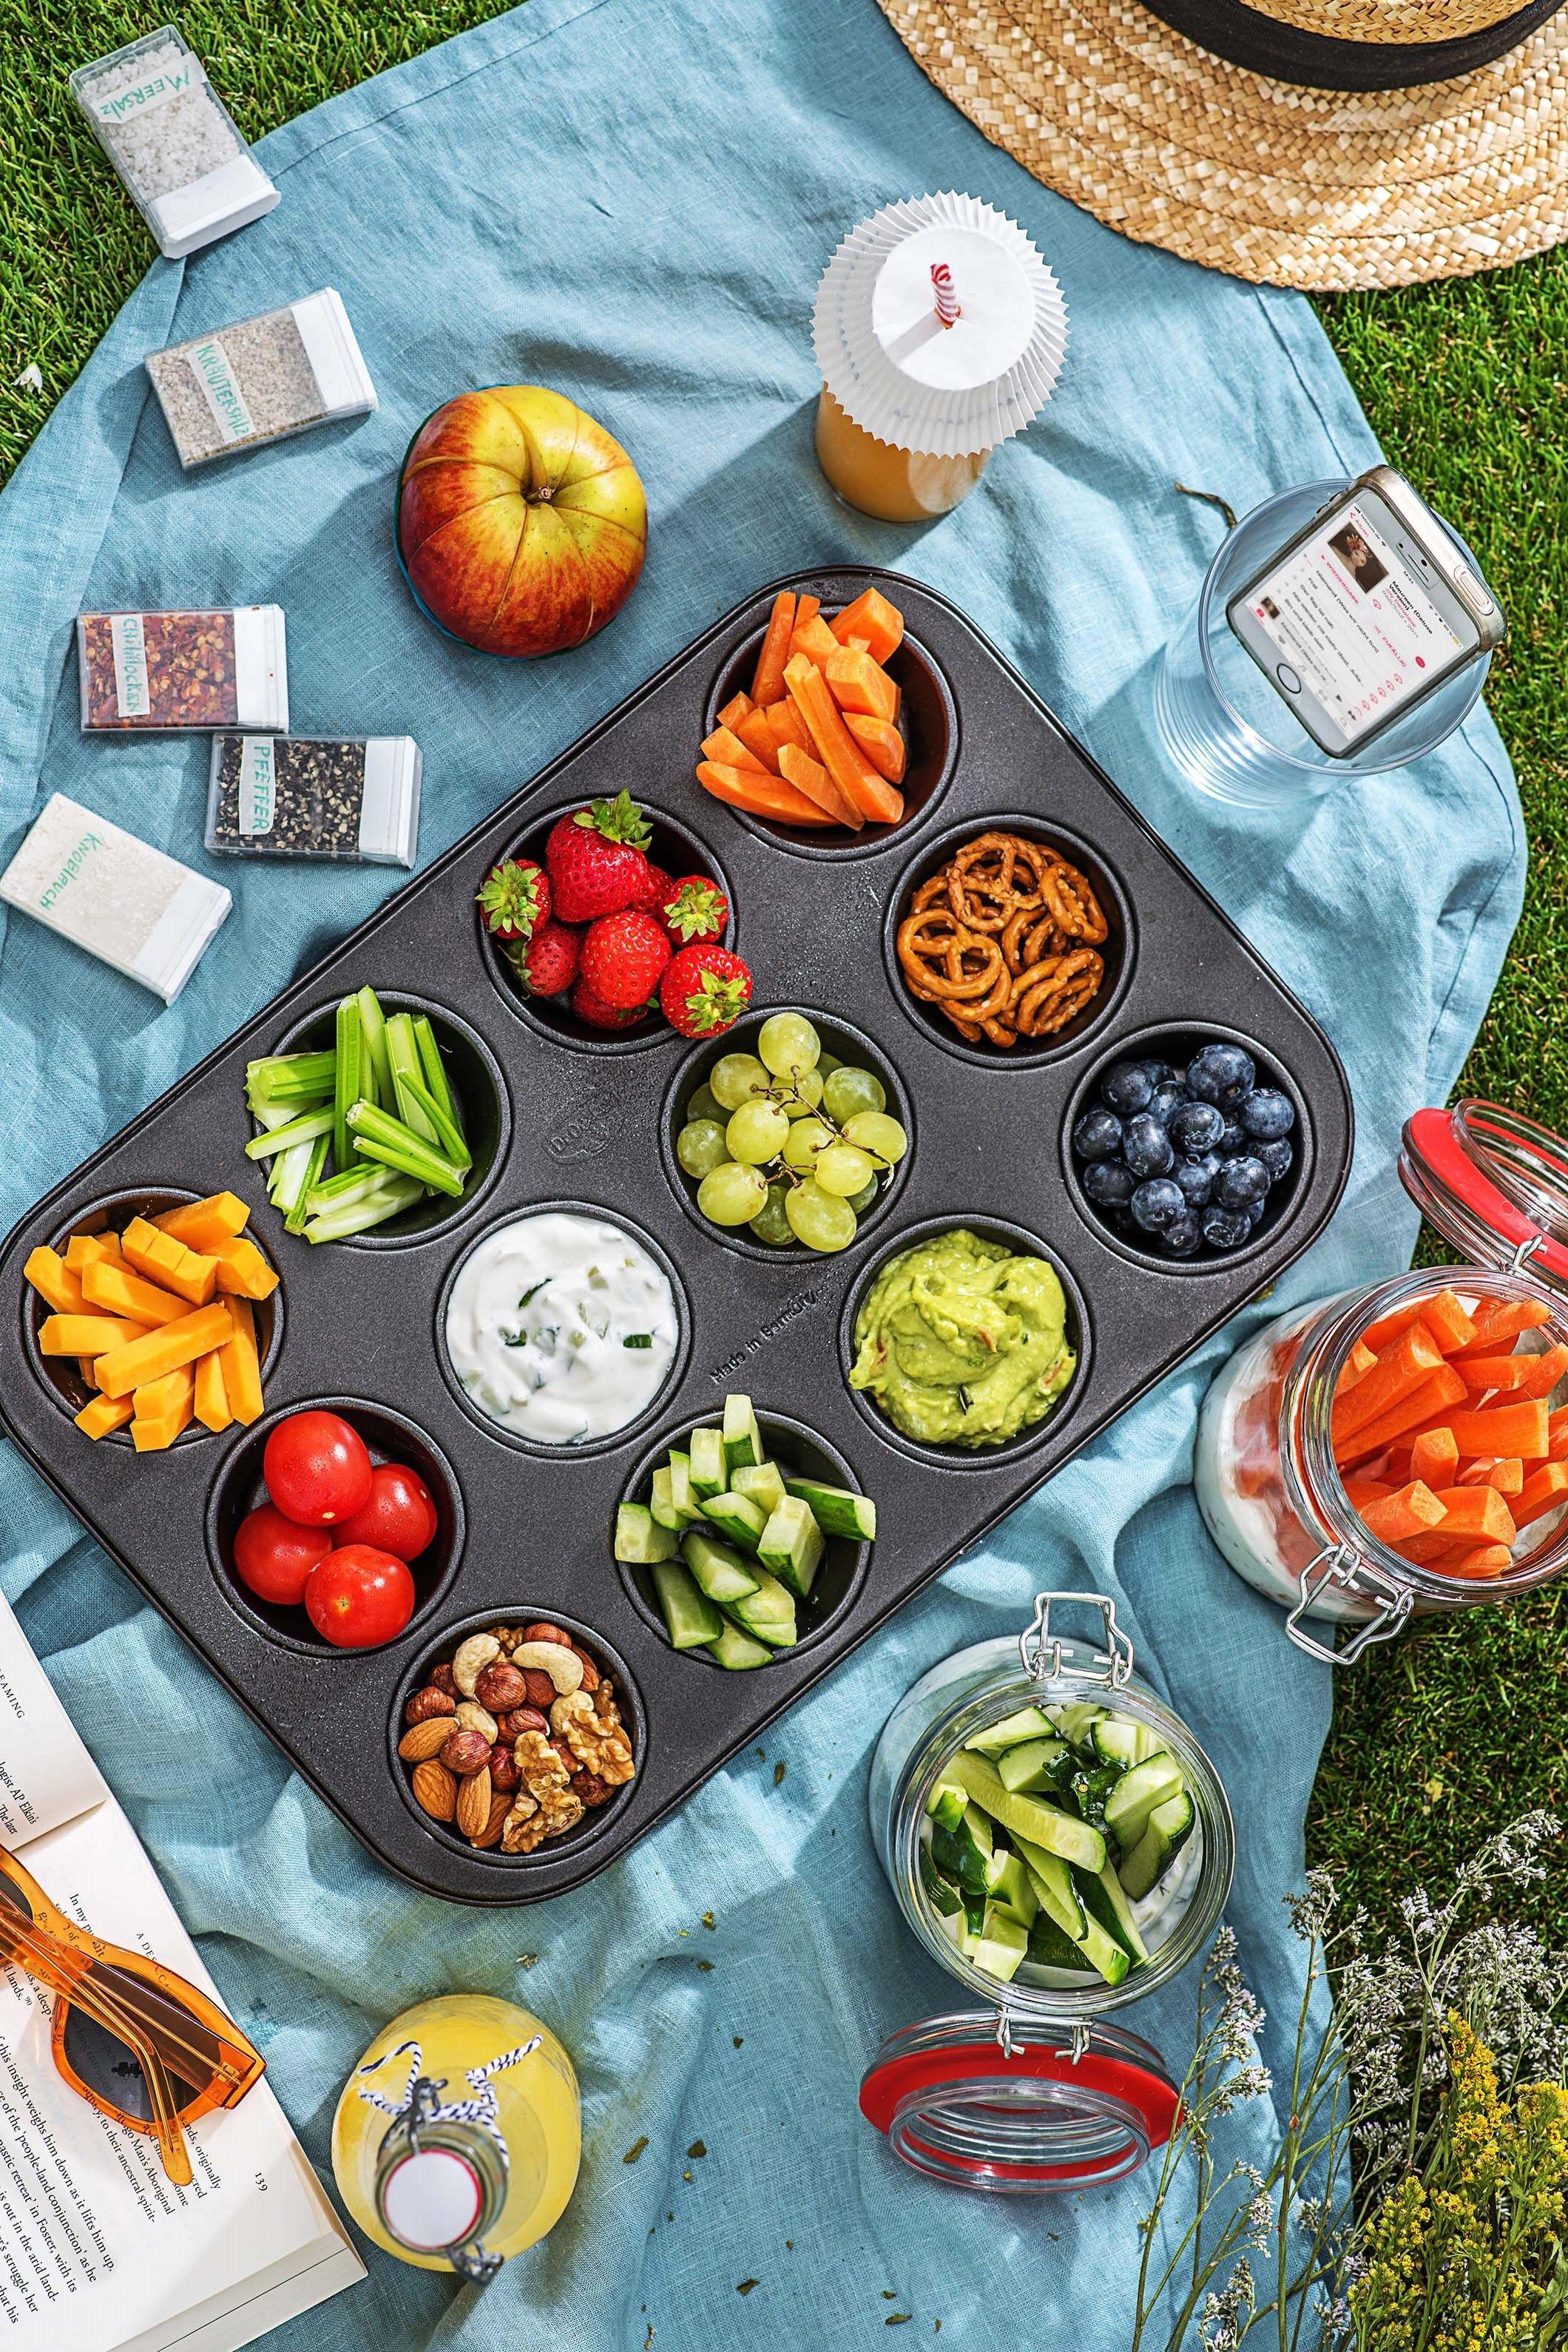 mit diesen picknick ideen wirst du zum picknick profi photography picknick ideen rezepte. Black Bedroom Furniture Sets. Home Design Ideas